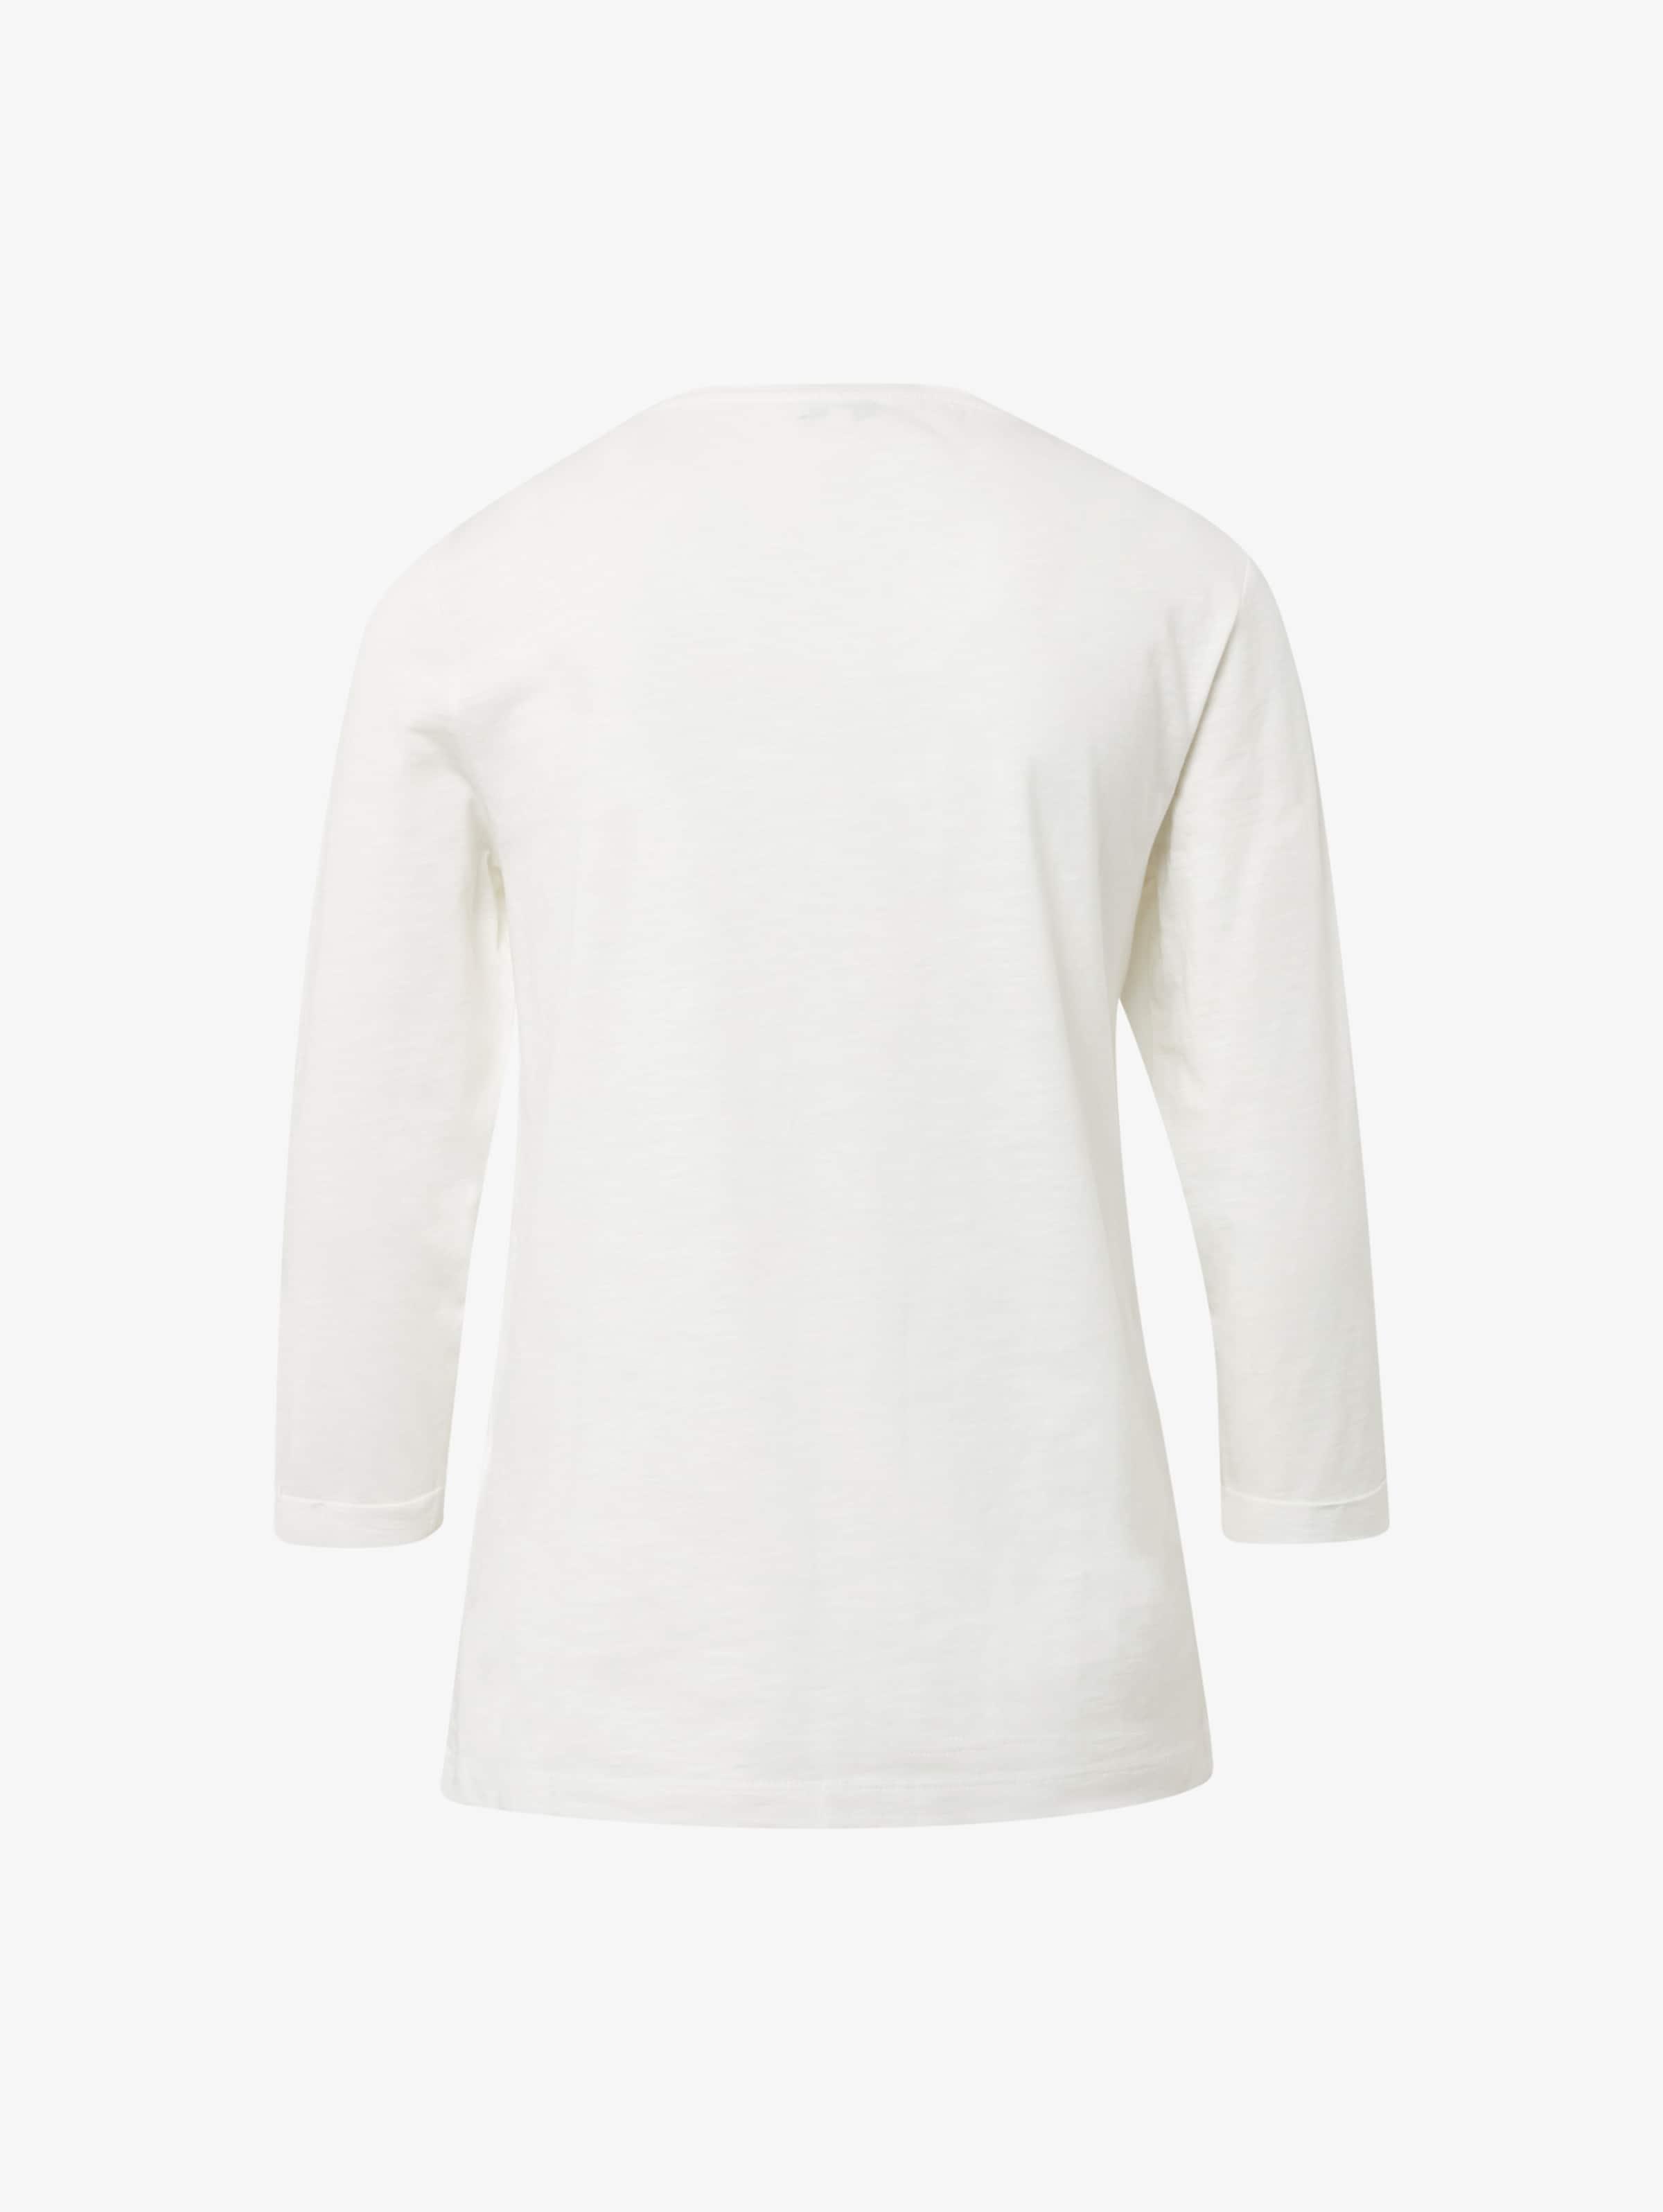 HellblauWeiß T shirt In Tailor Tom qVpSzGUM